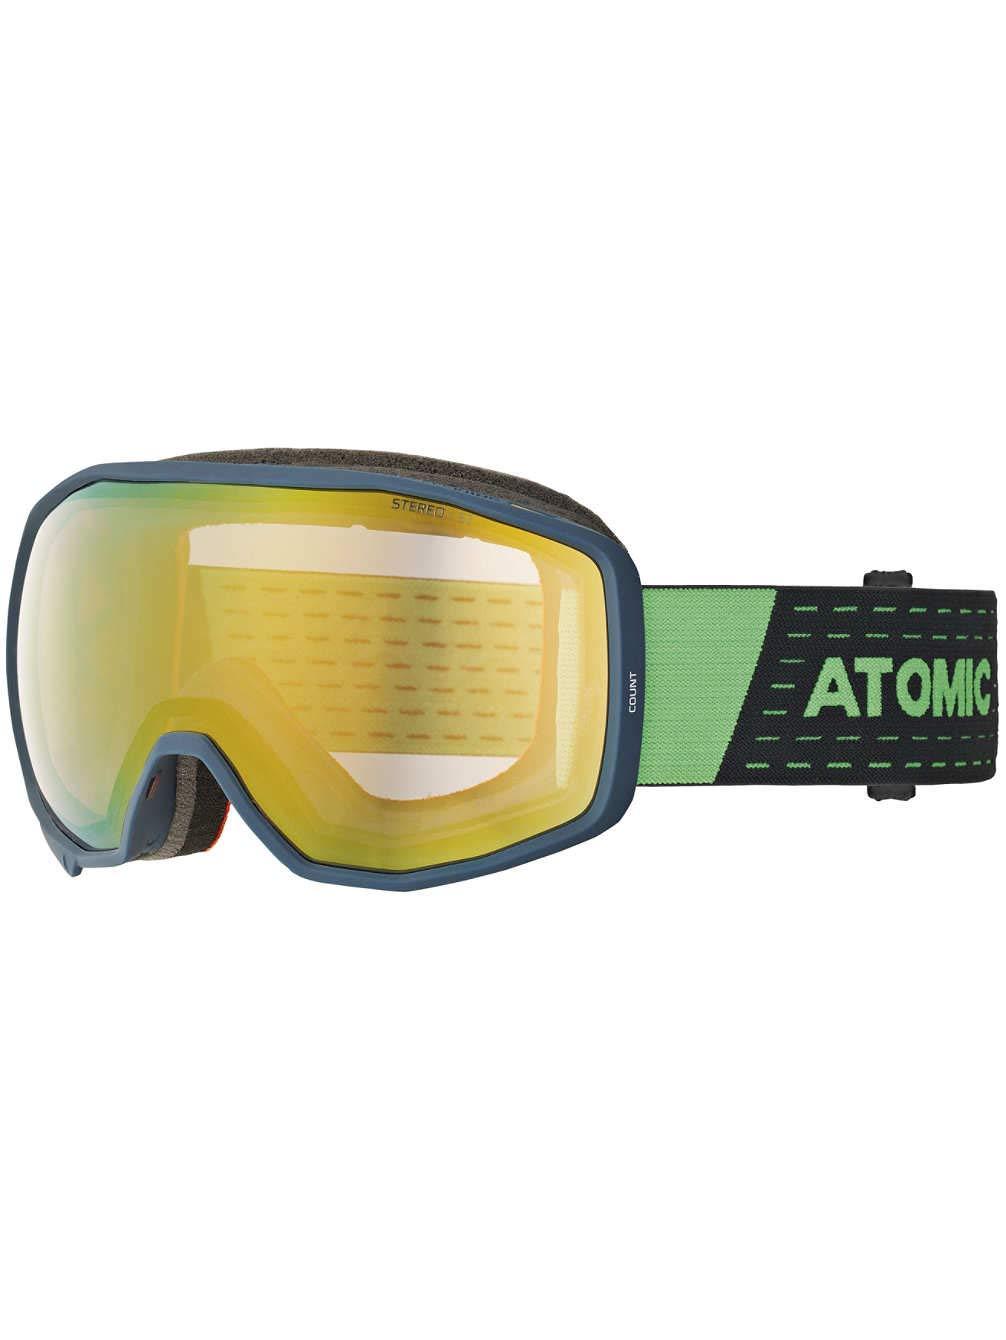 Atomic Skibrille amazon